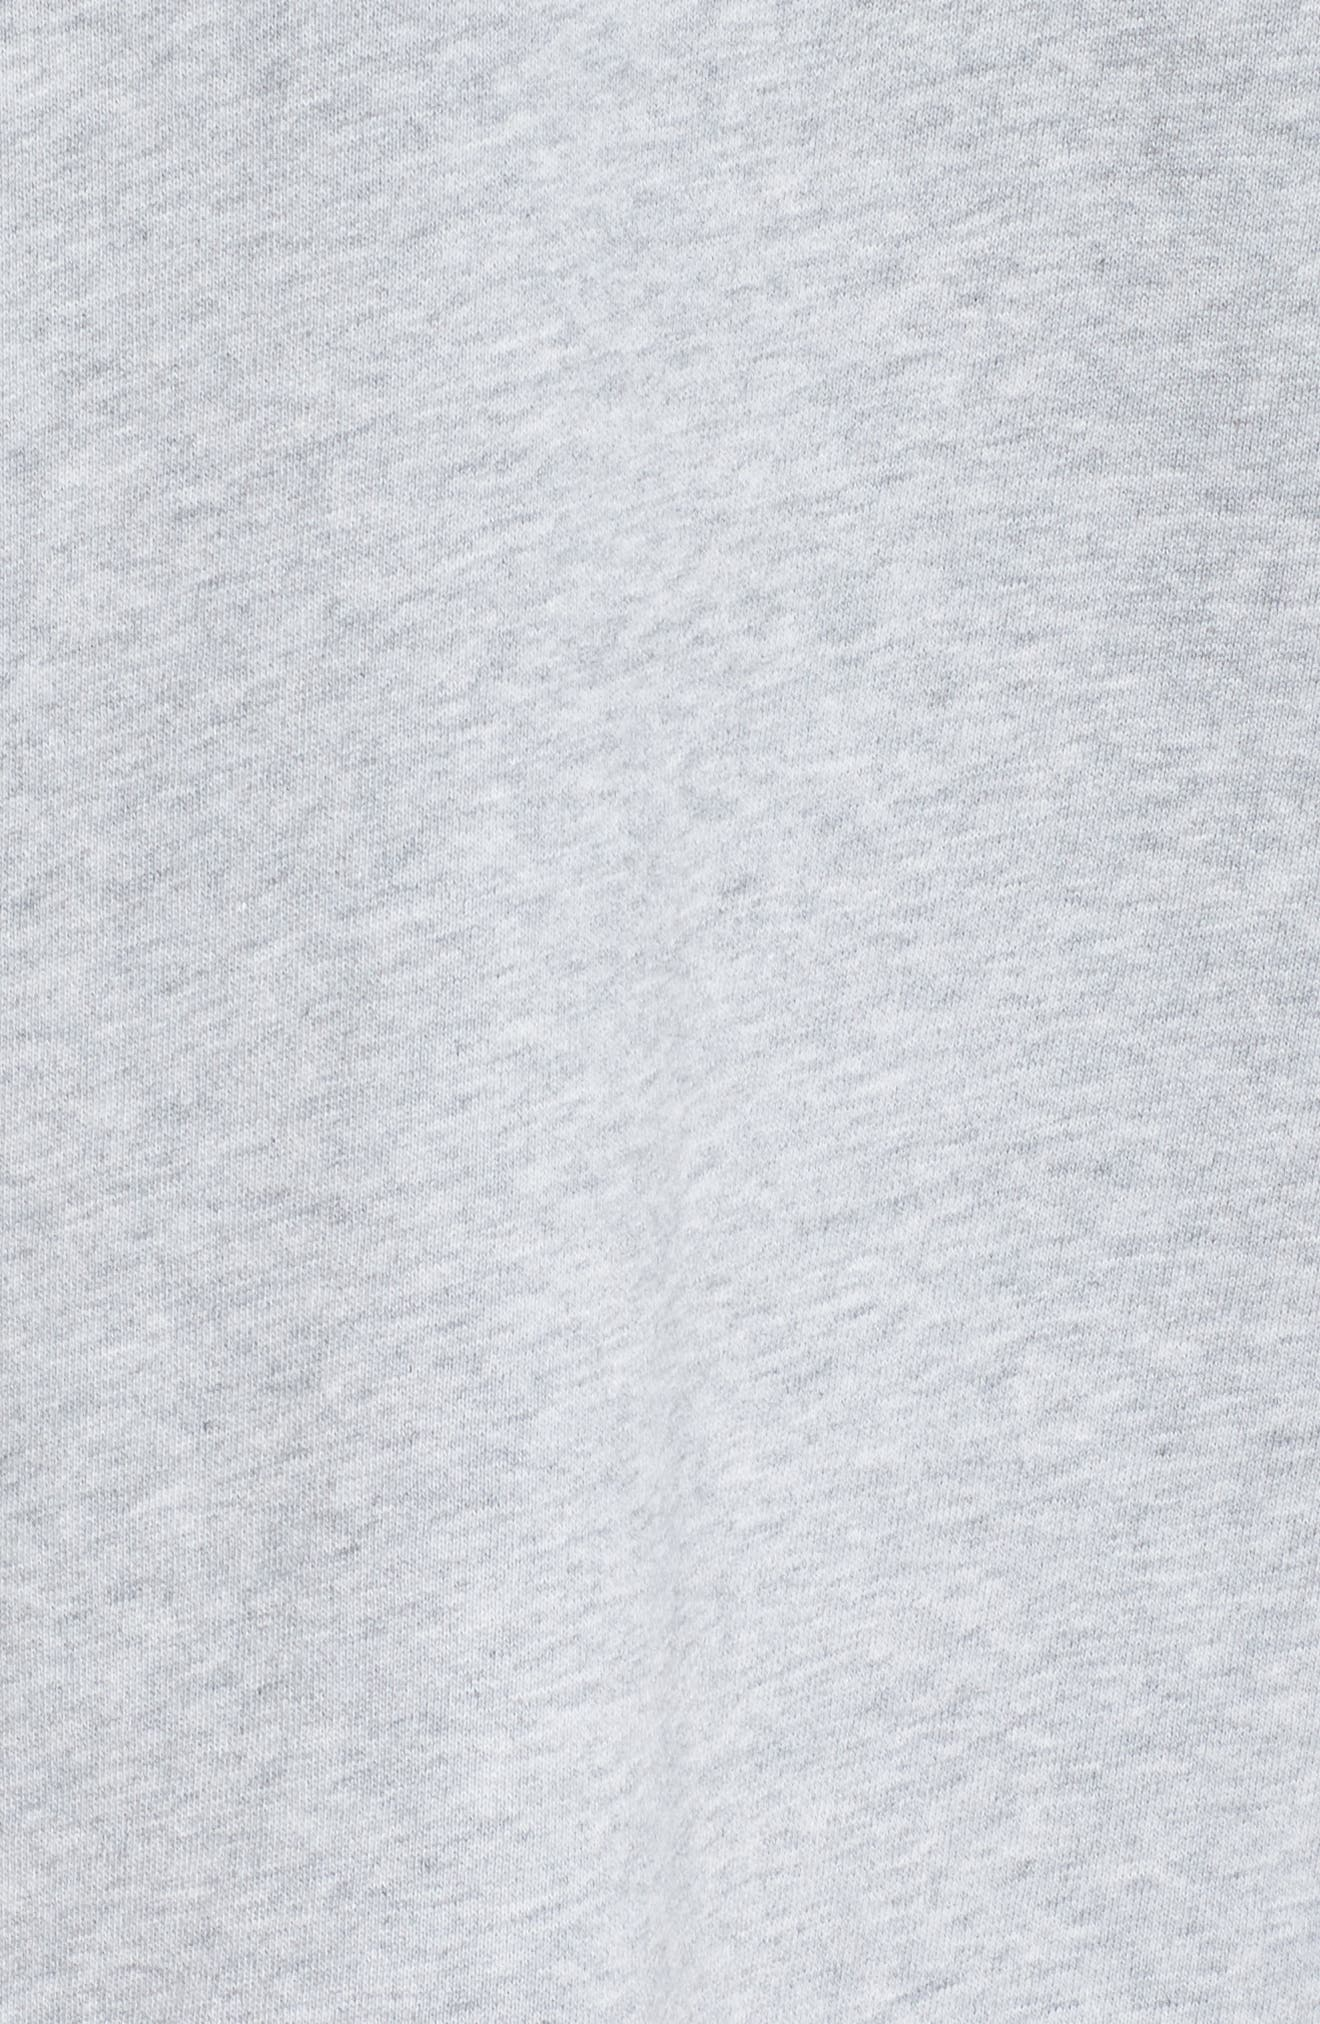 Club55 Cutout Back Sweatshirt,                             Alternate thumbnail 6, color,                             GREY MARLE